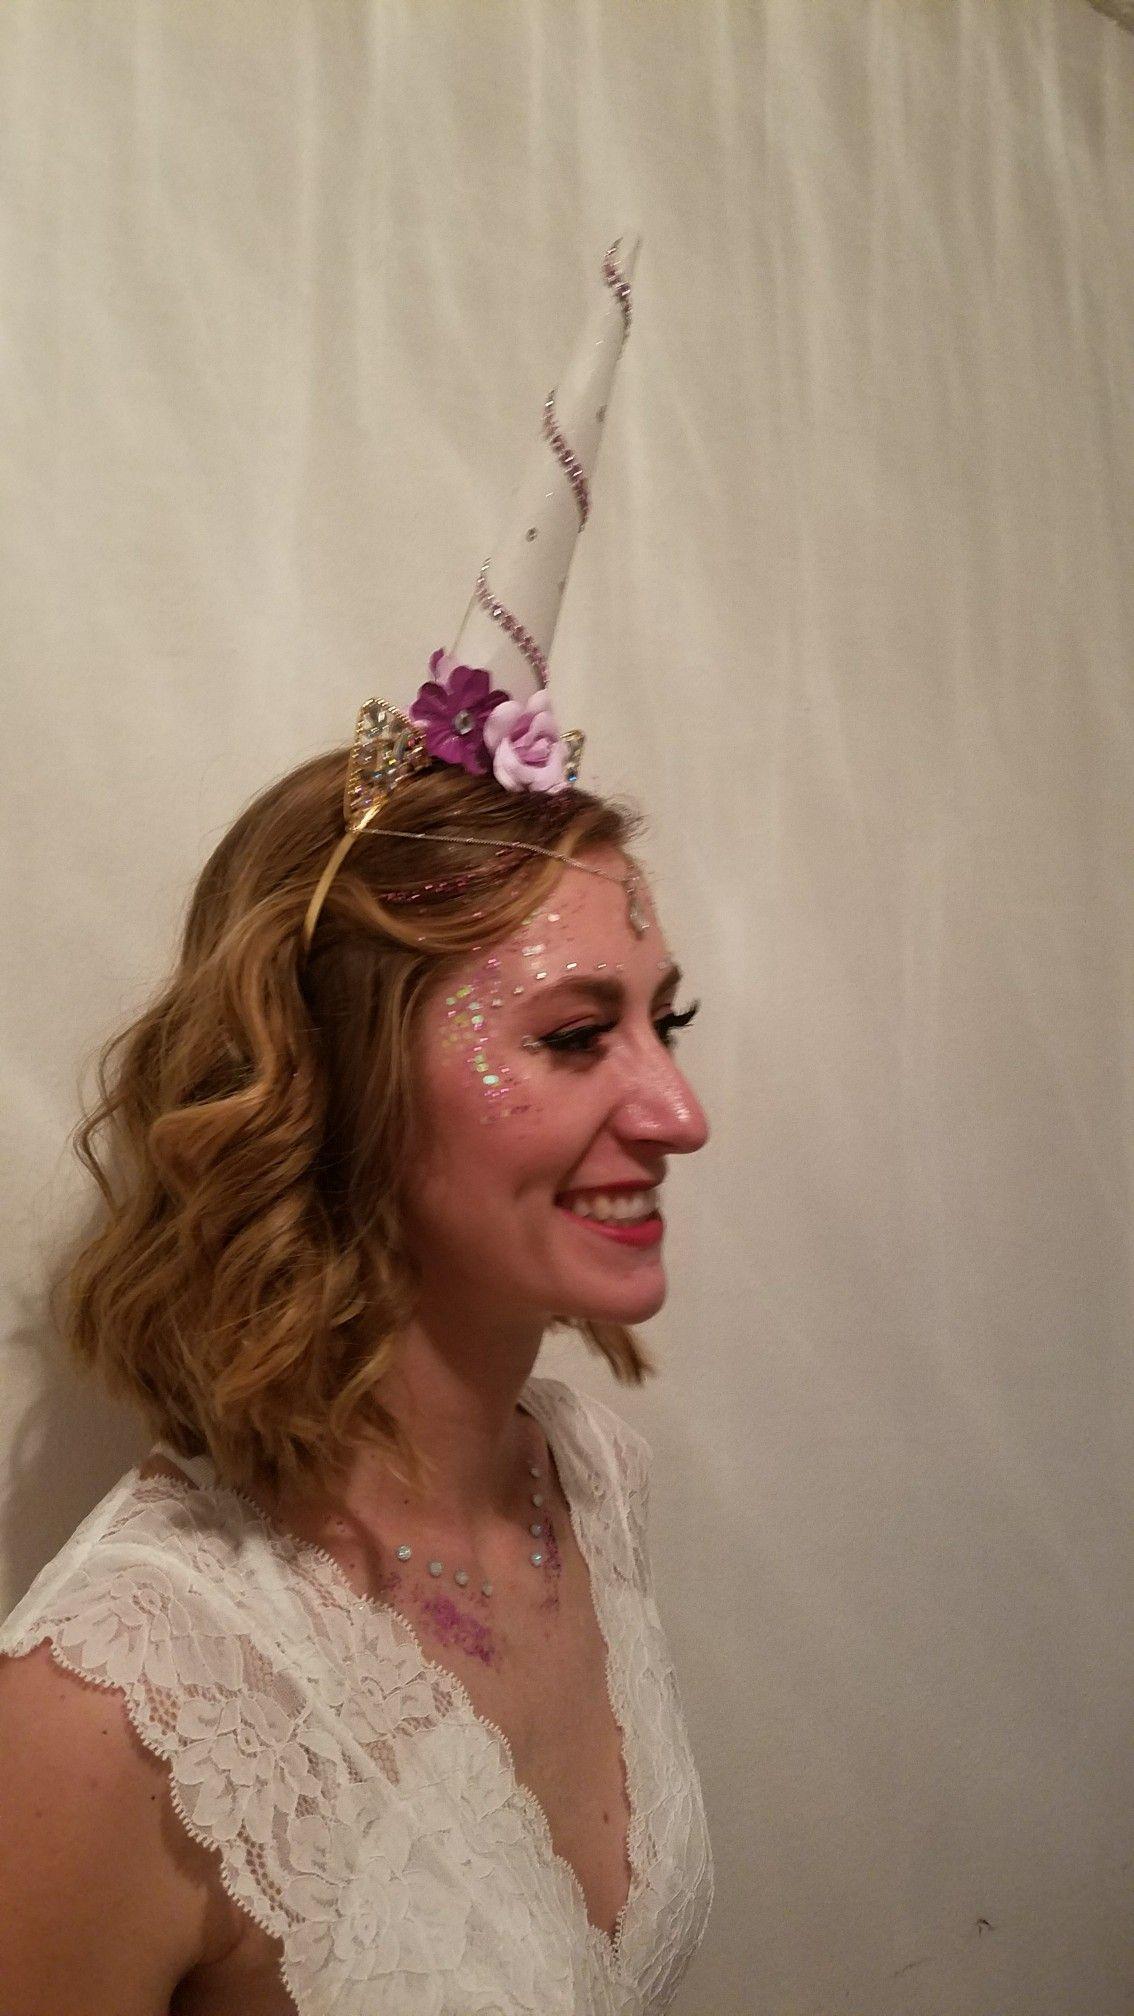 Homemade unicorn horn and headpiece for Halloween!